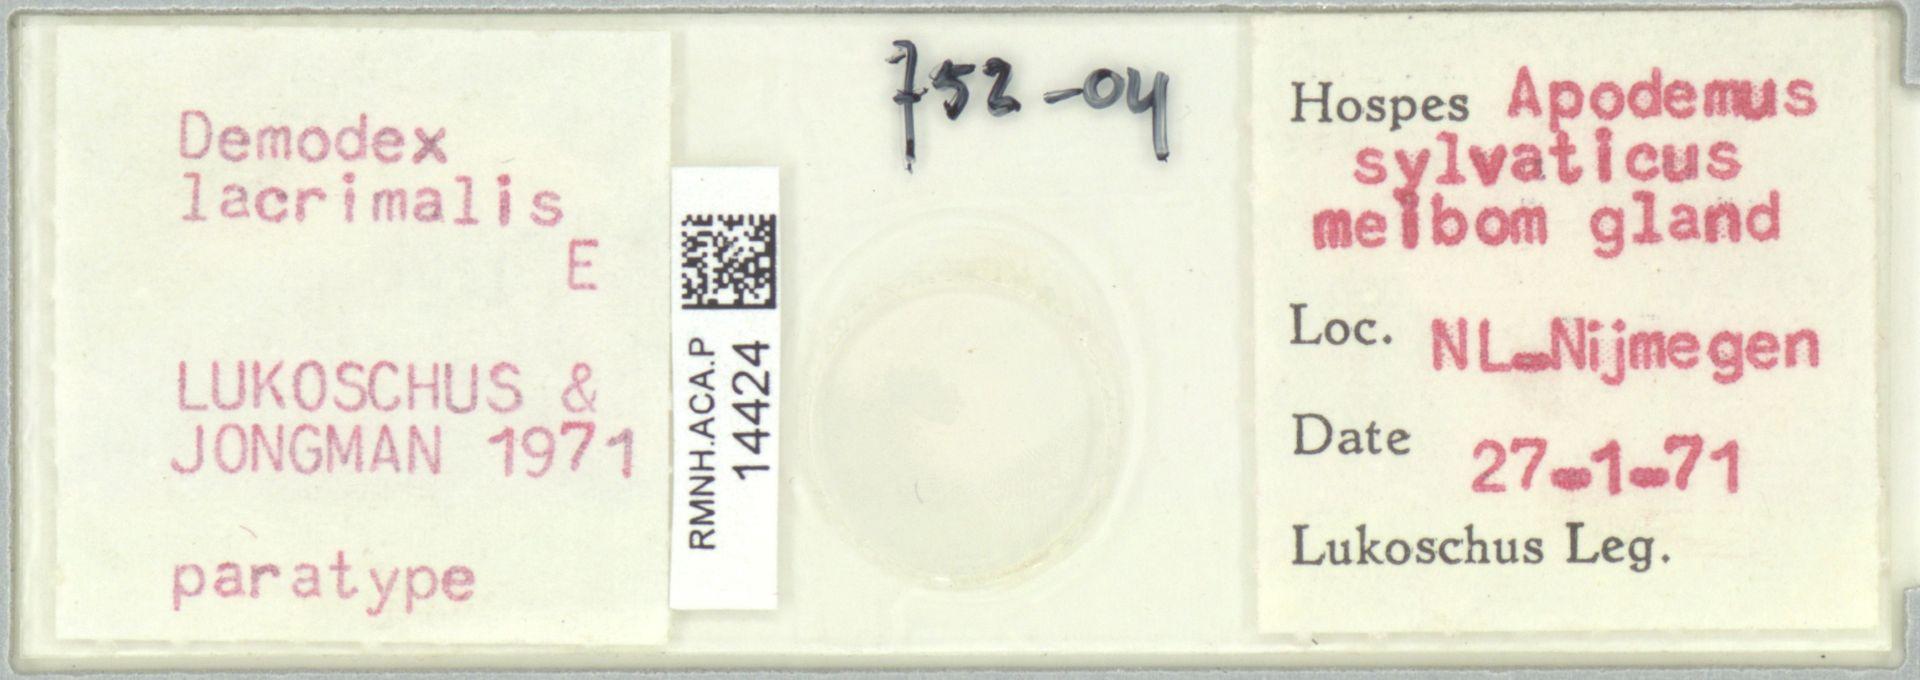 RMNH.ACA.P.14424 | Demodex lacrimalis Lukoschus & Jongman, 1971